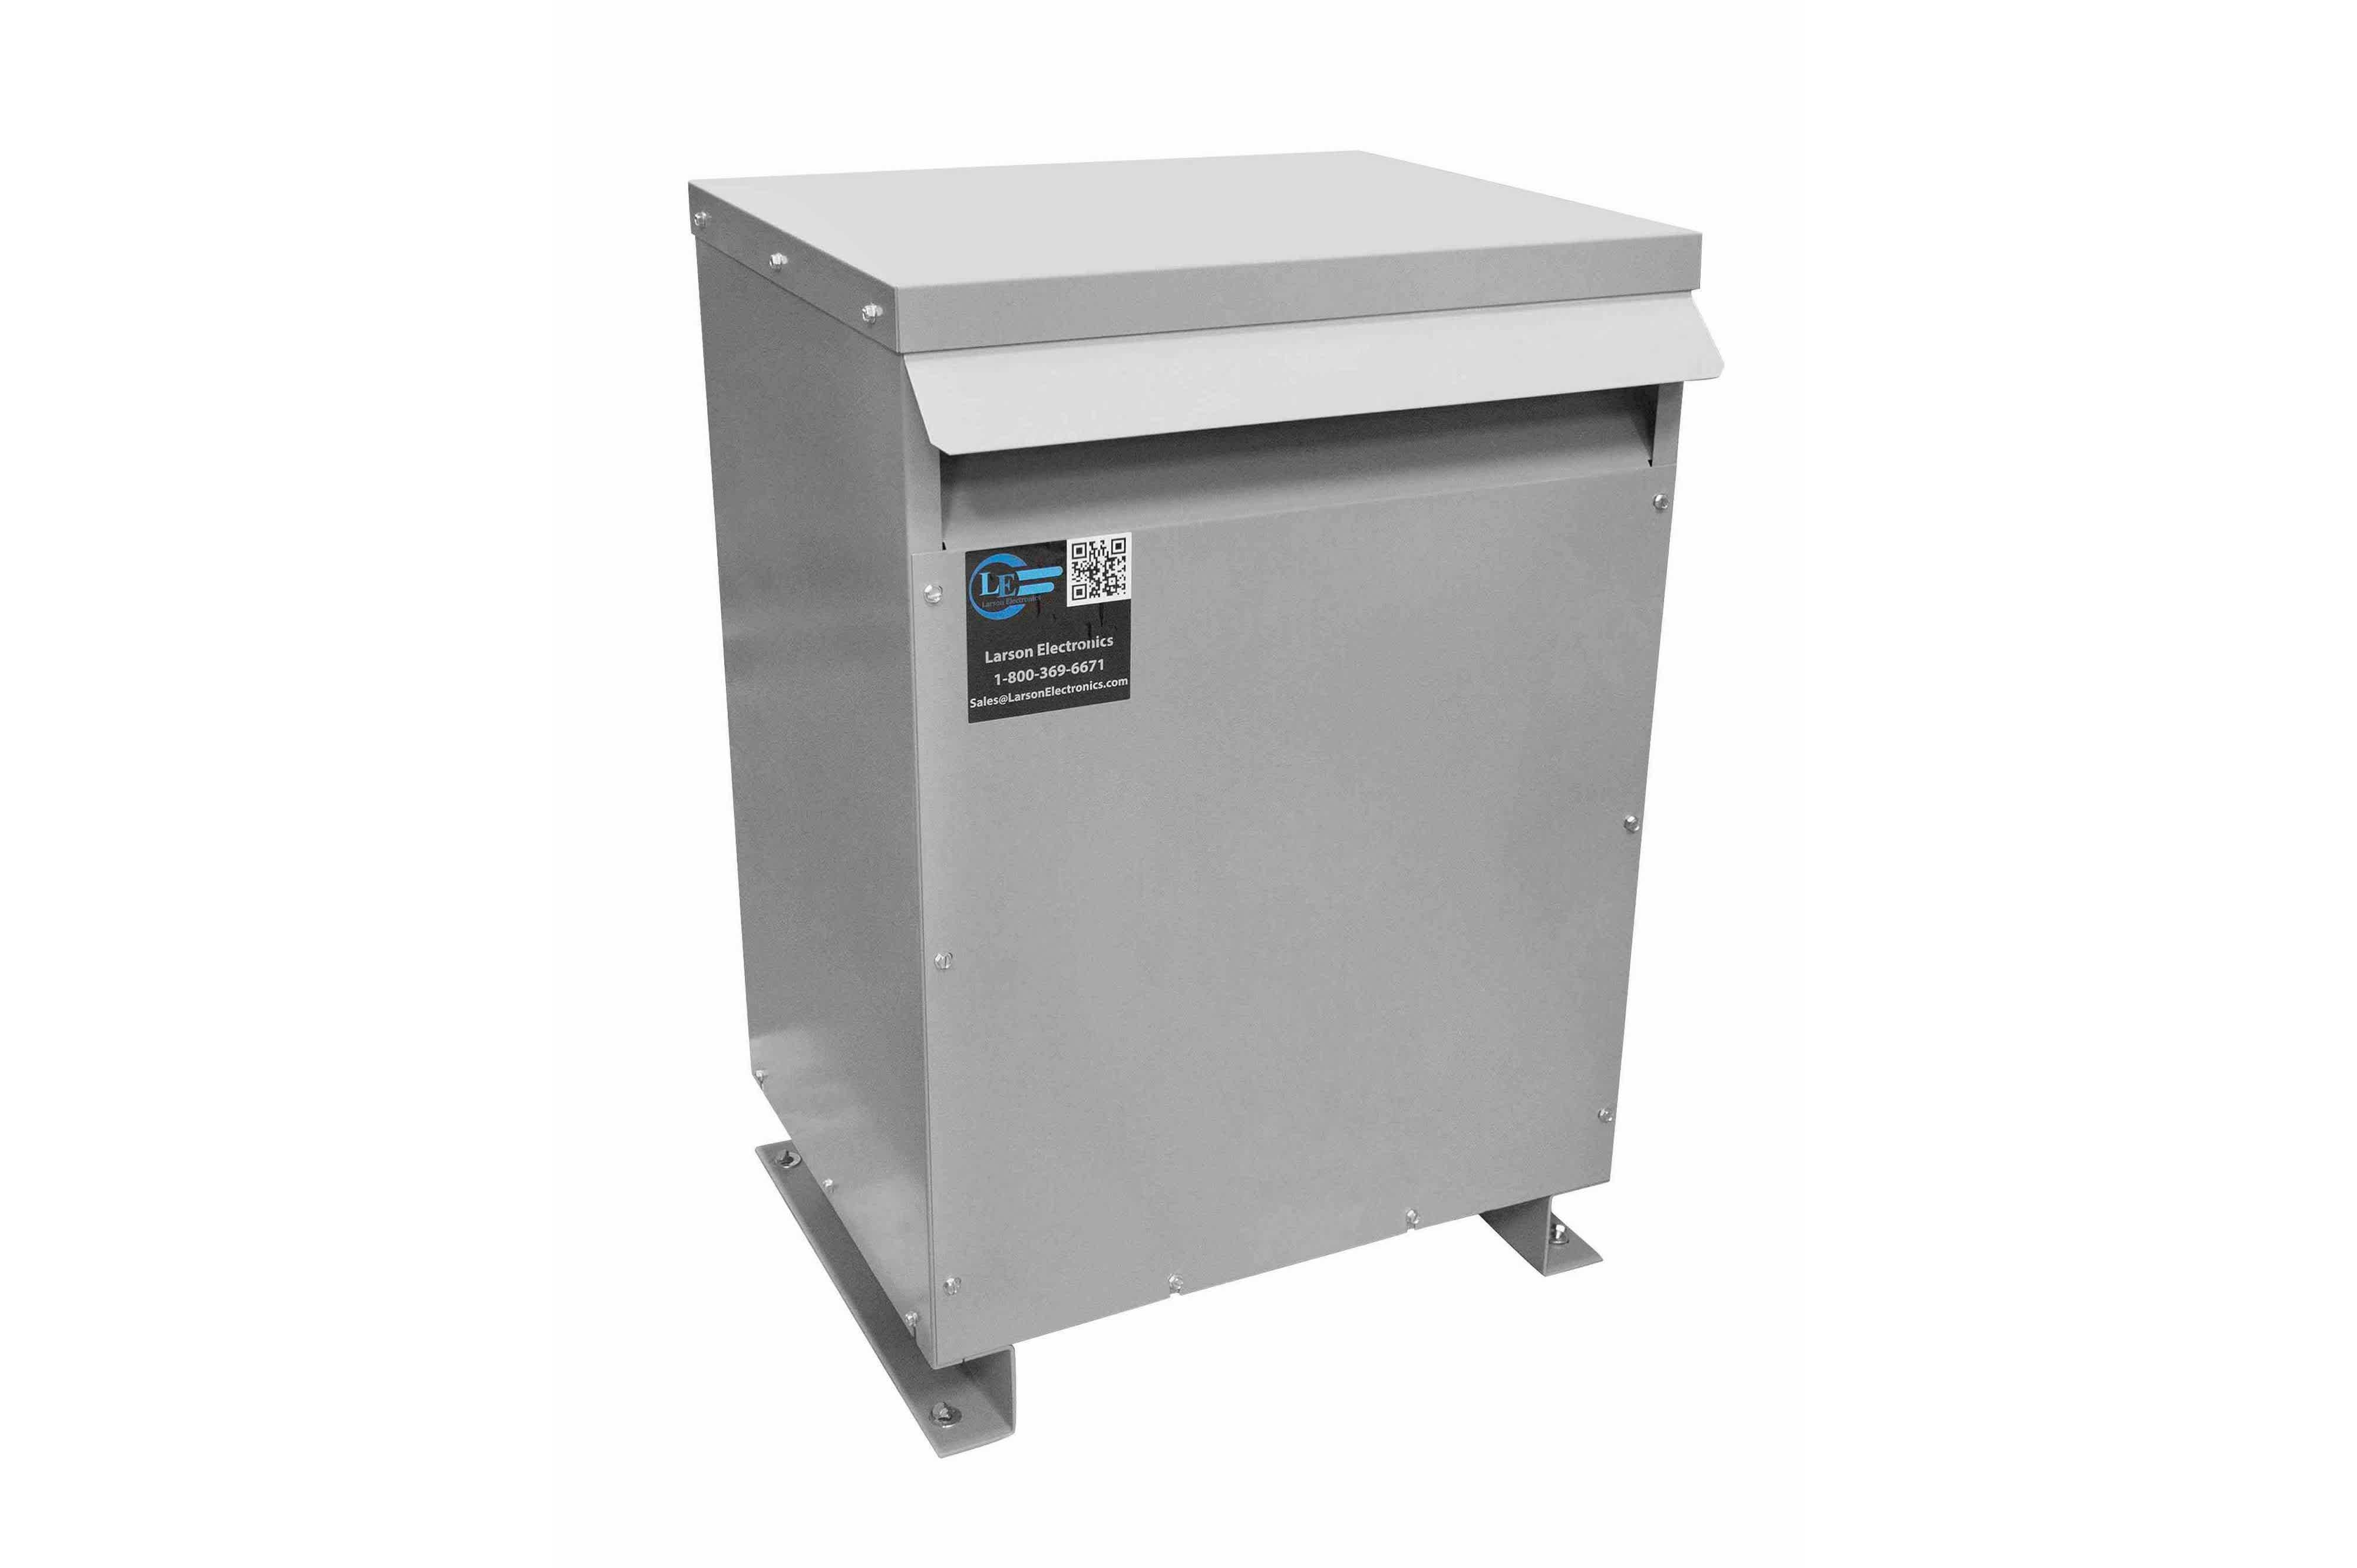 750 kVA 3PH DOE Transformer, 600V Delta Primary, 415Y/240 Wye-N Secondary, N3R, Ventilated, 60 Hz